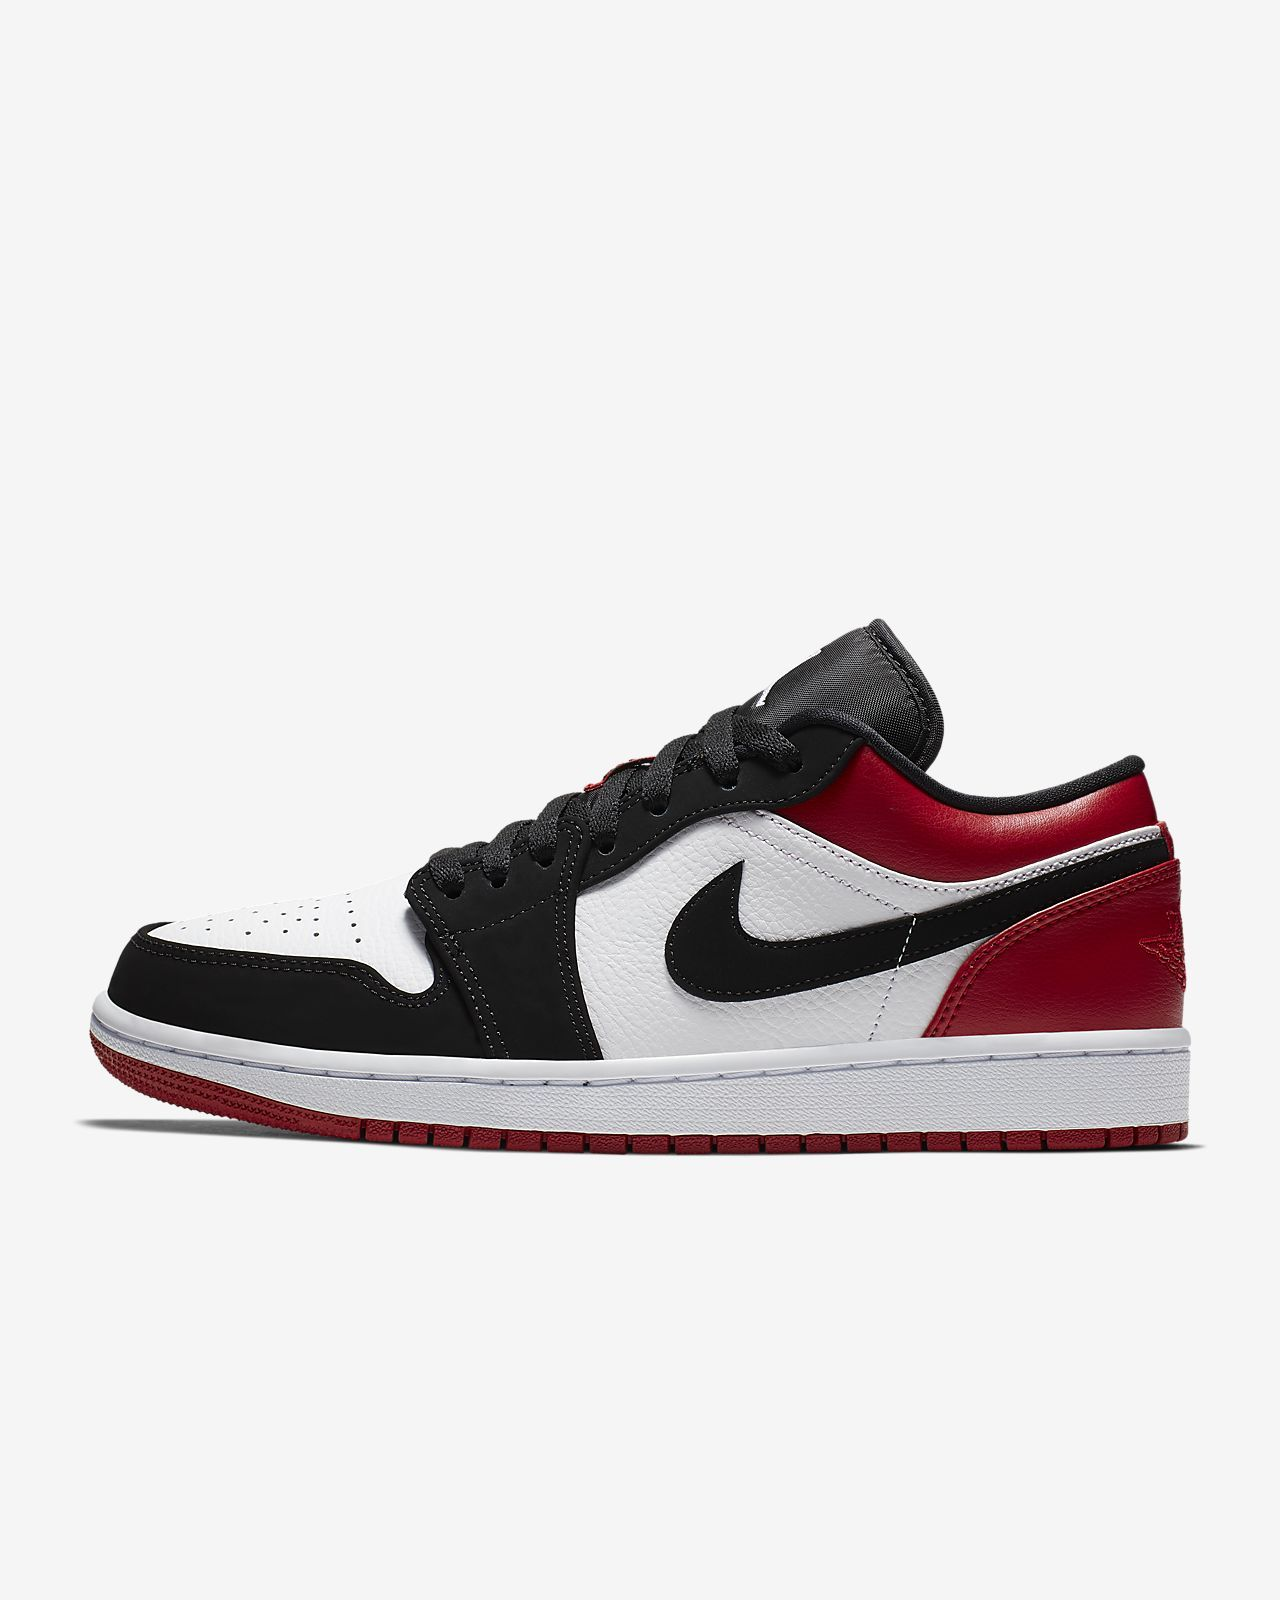 Calzado para hombre Air Jordan 1 Low. Nike.com MX | Air ...